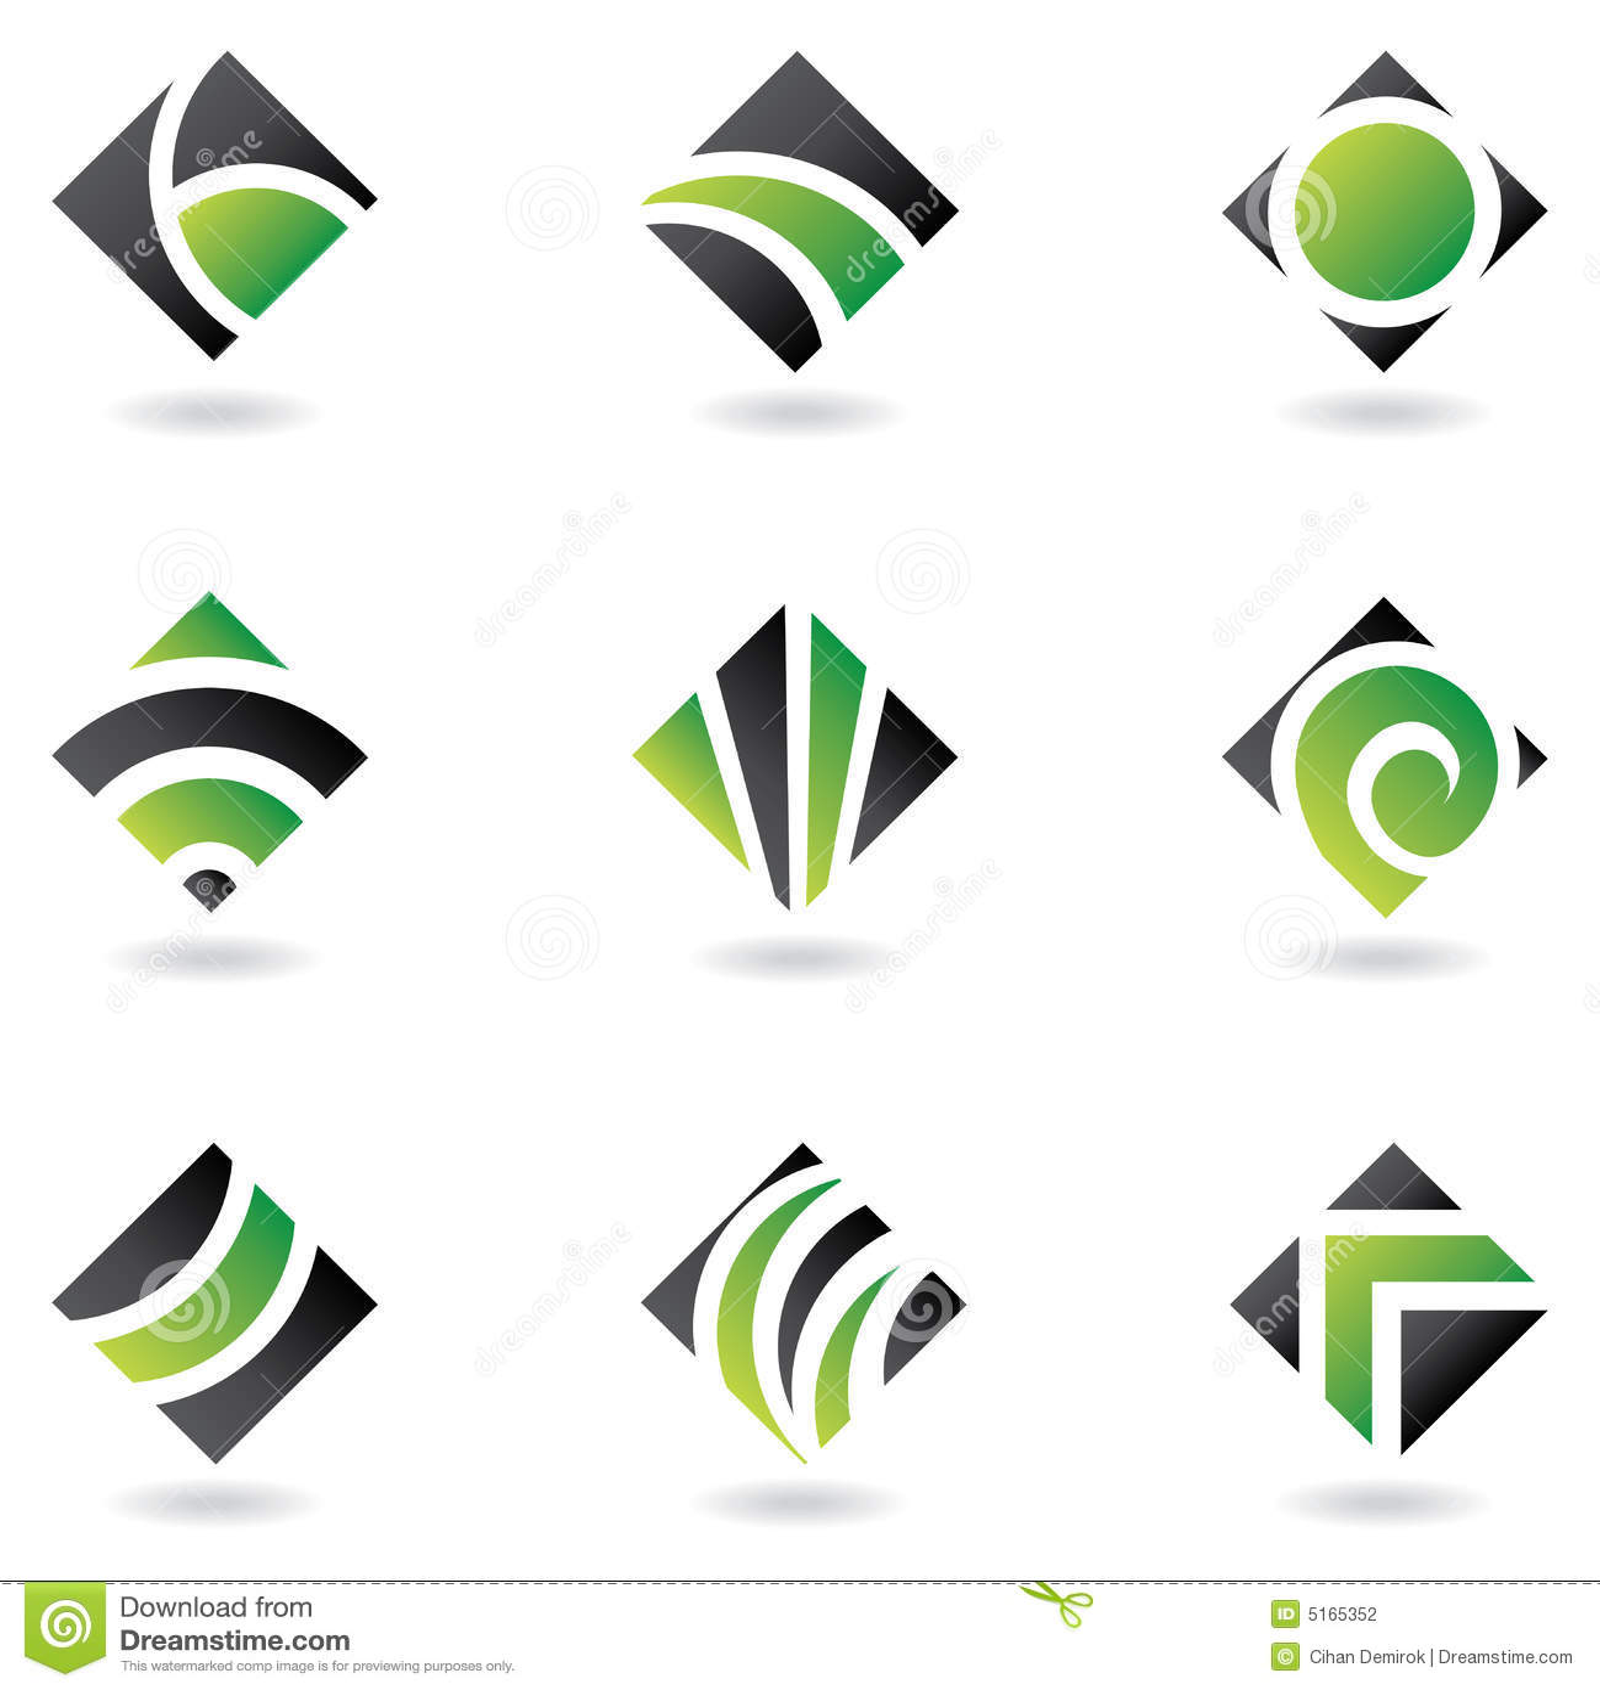 Green diamond logos